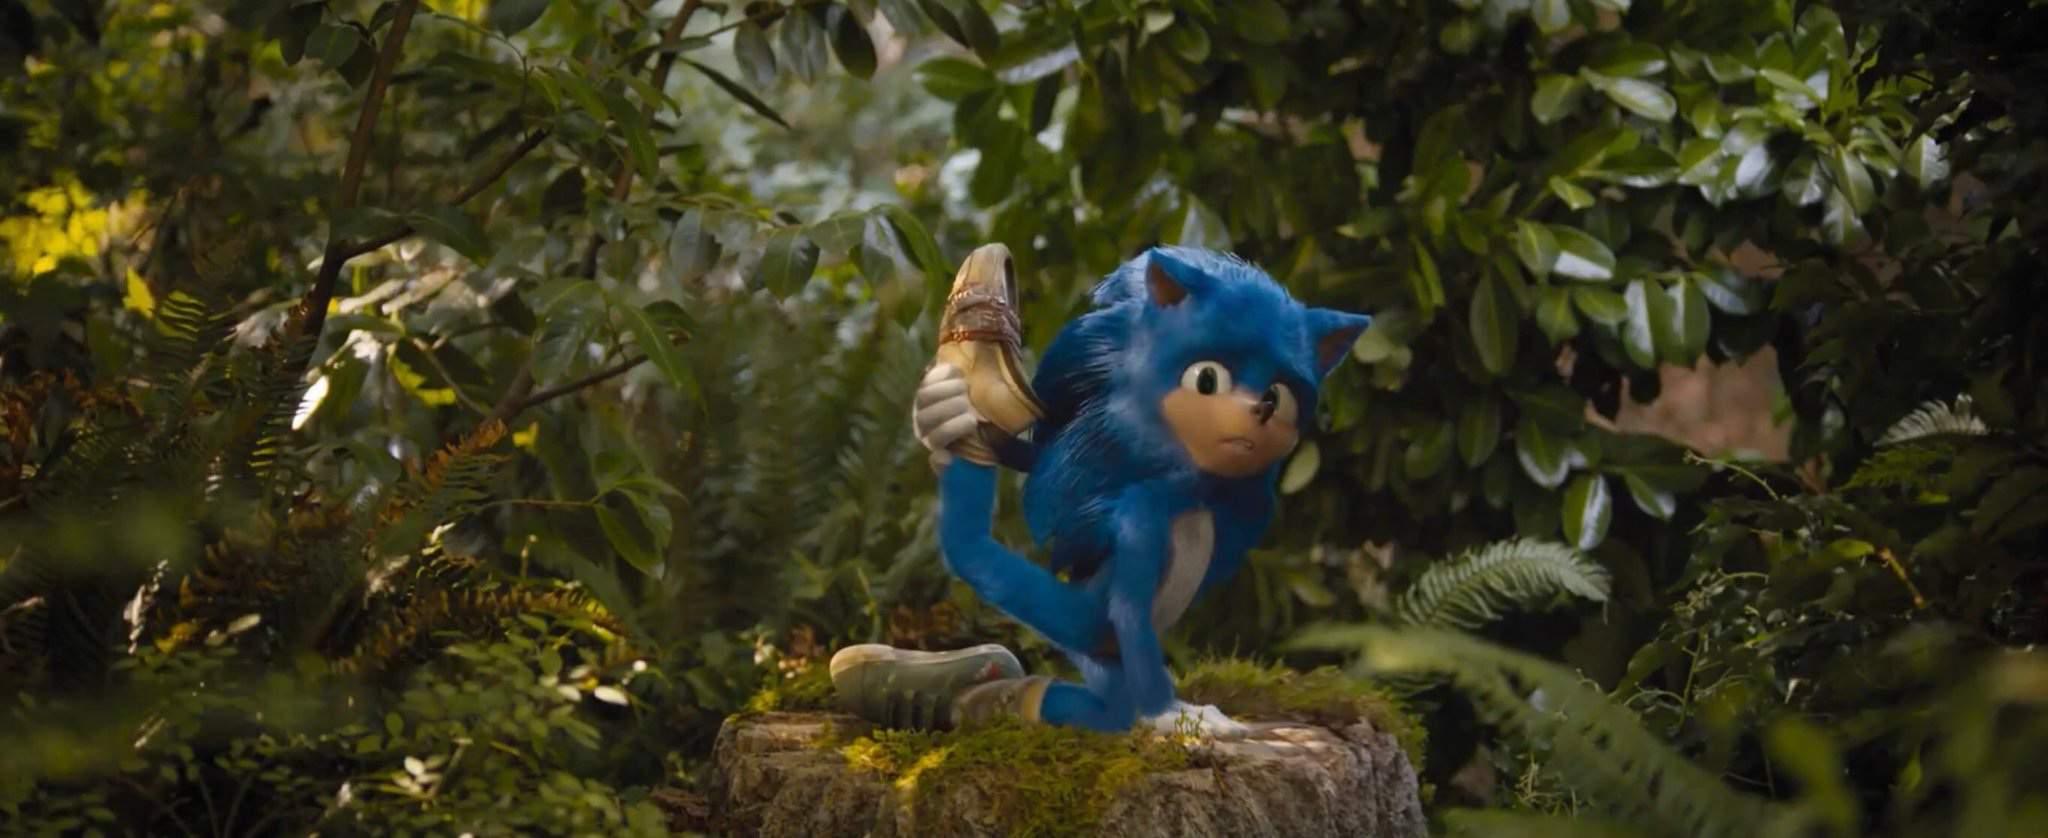 Sonic Movie Old Design Leak Sonic The Hedgehog Amino